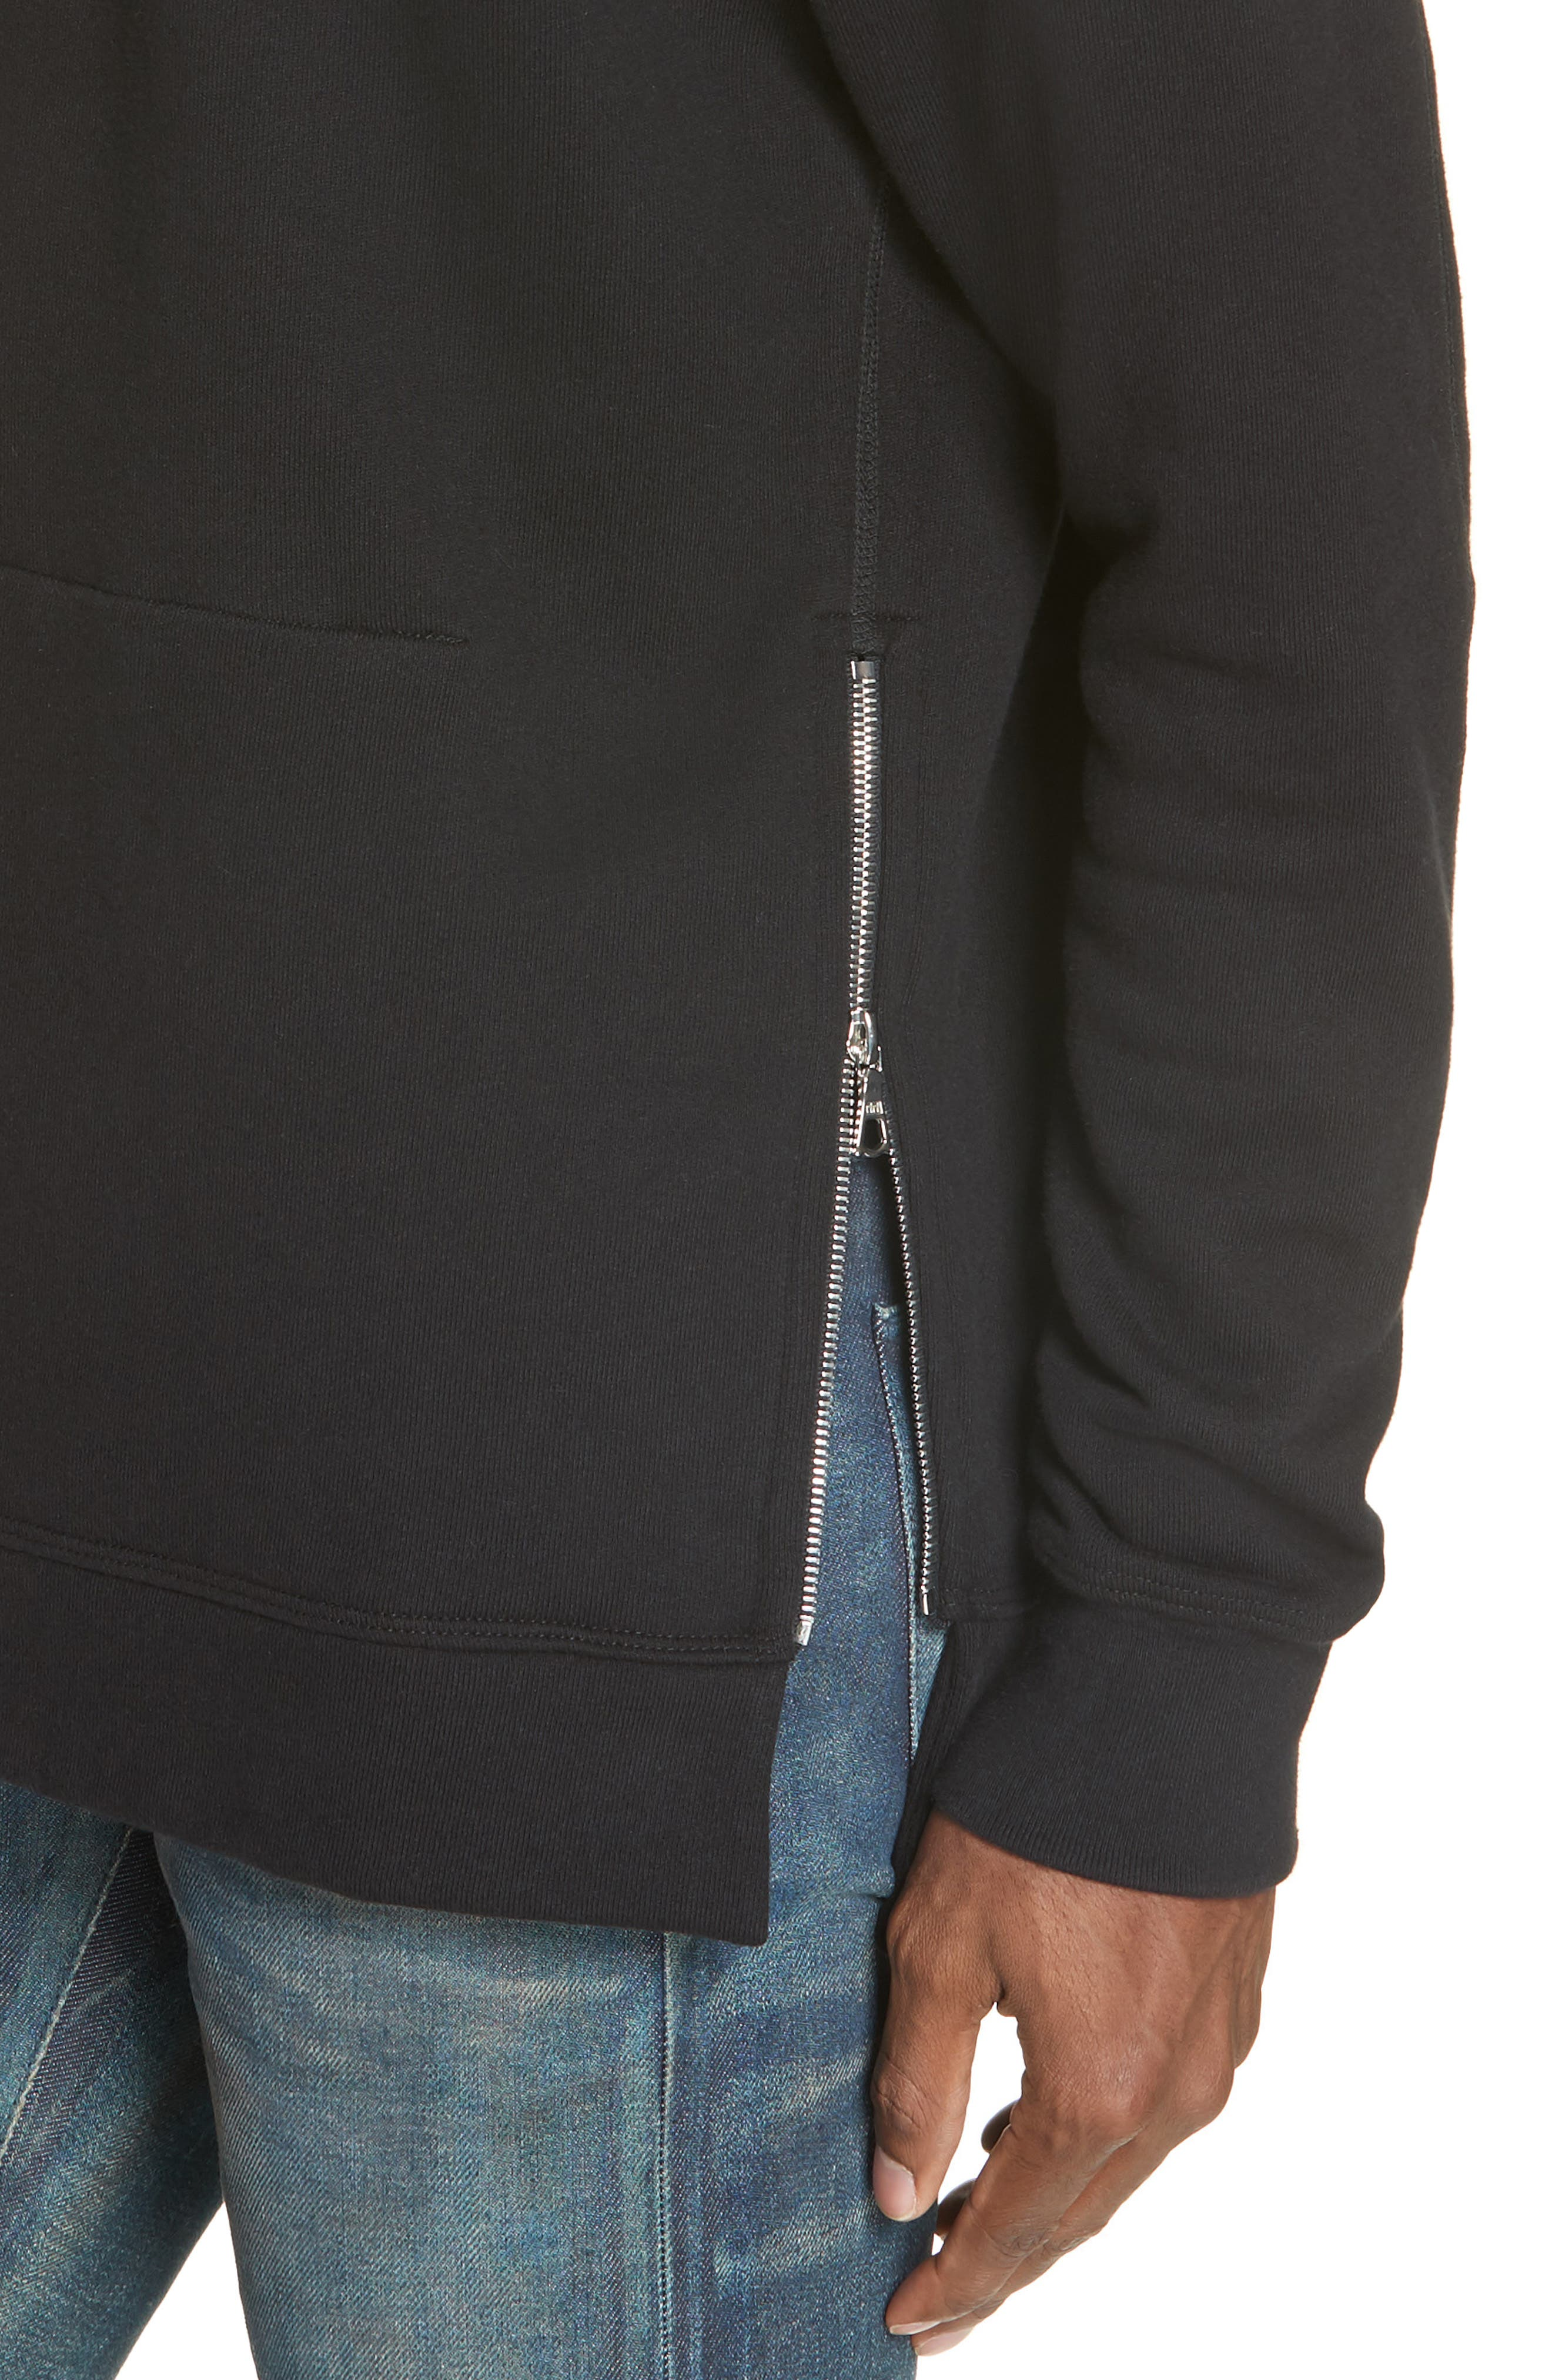 JOHN ELLIOTT, Hooded Villain Sweatshirt, Alternate thumbnail 4, color, BLACK